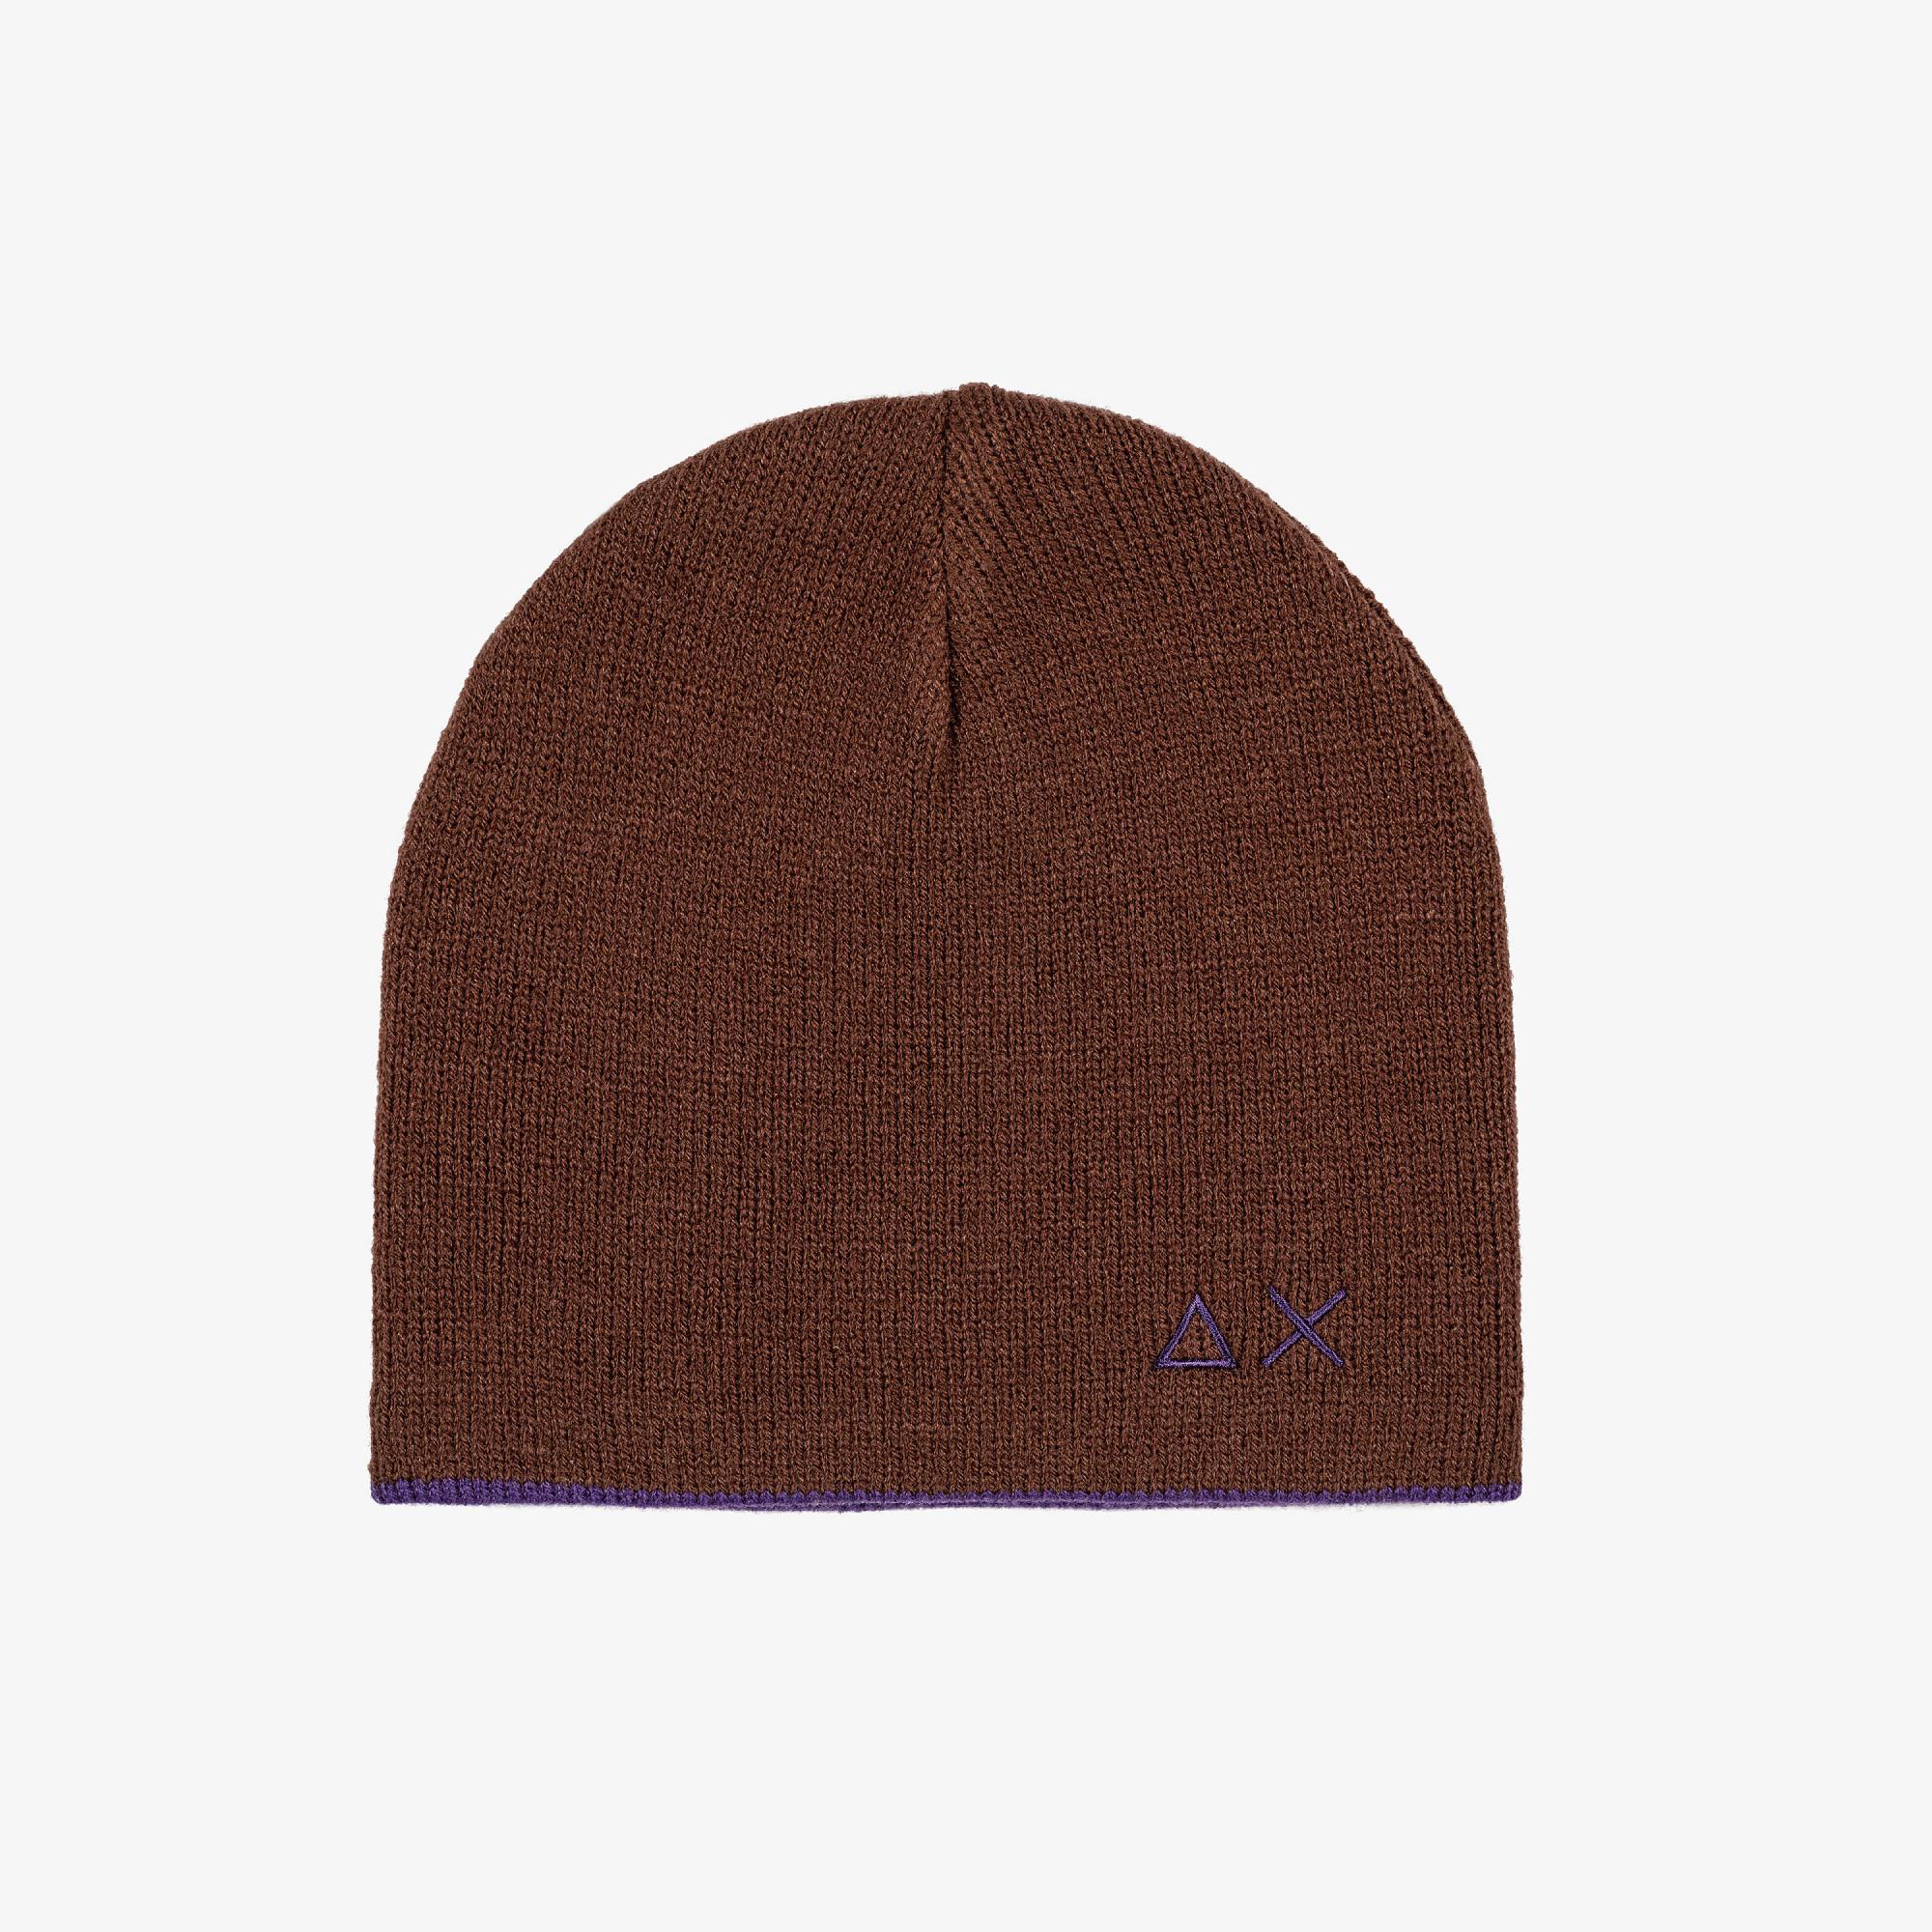 BOY'S CAP BASIC MARRONE